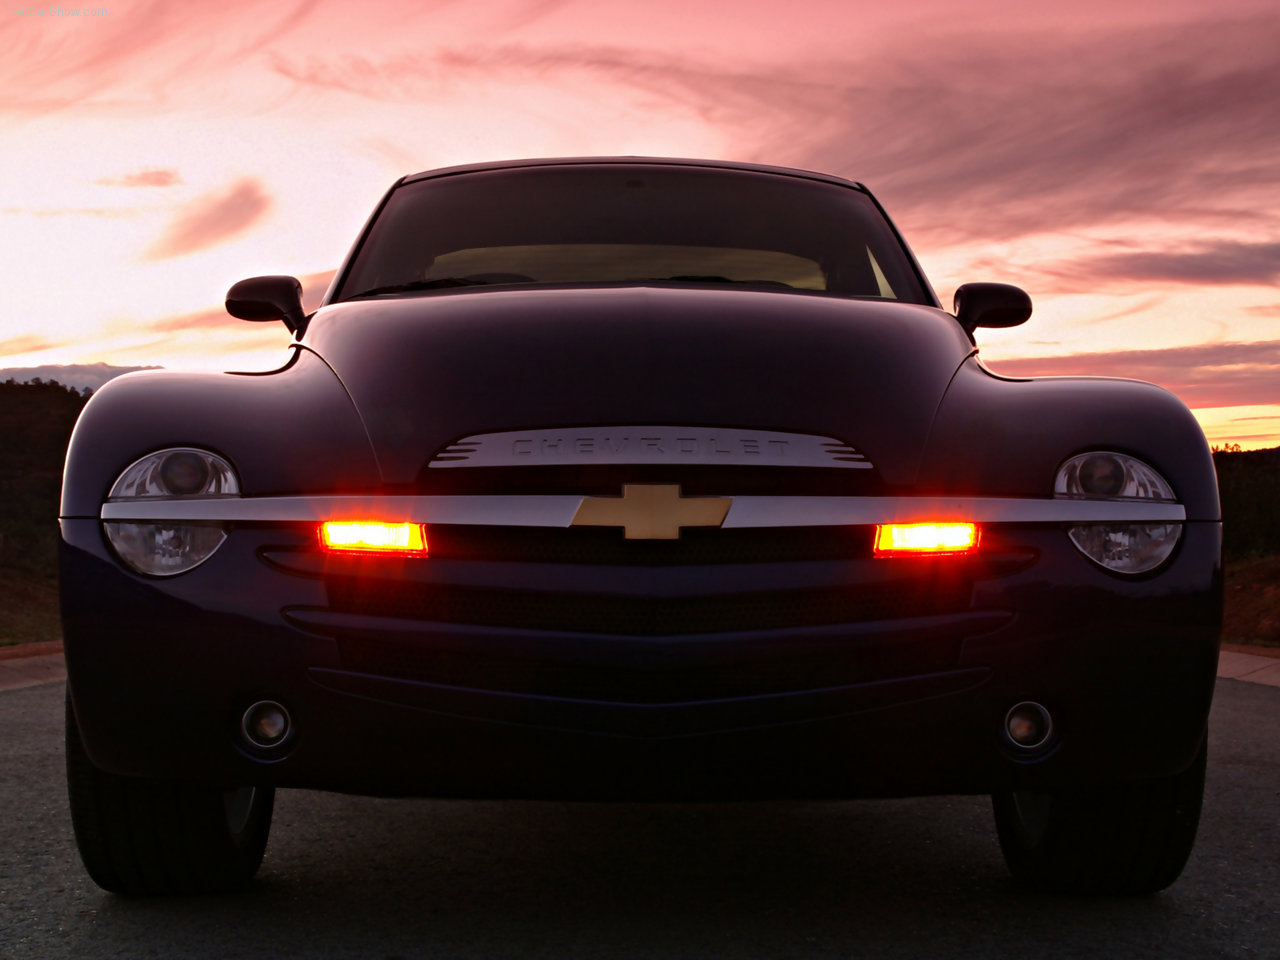 2003 Chevrolet SSR nose